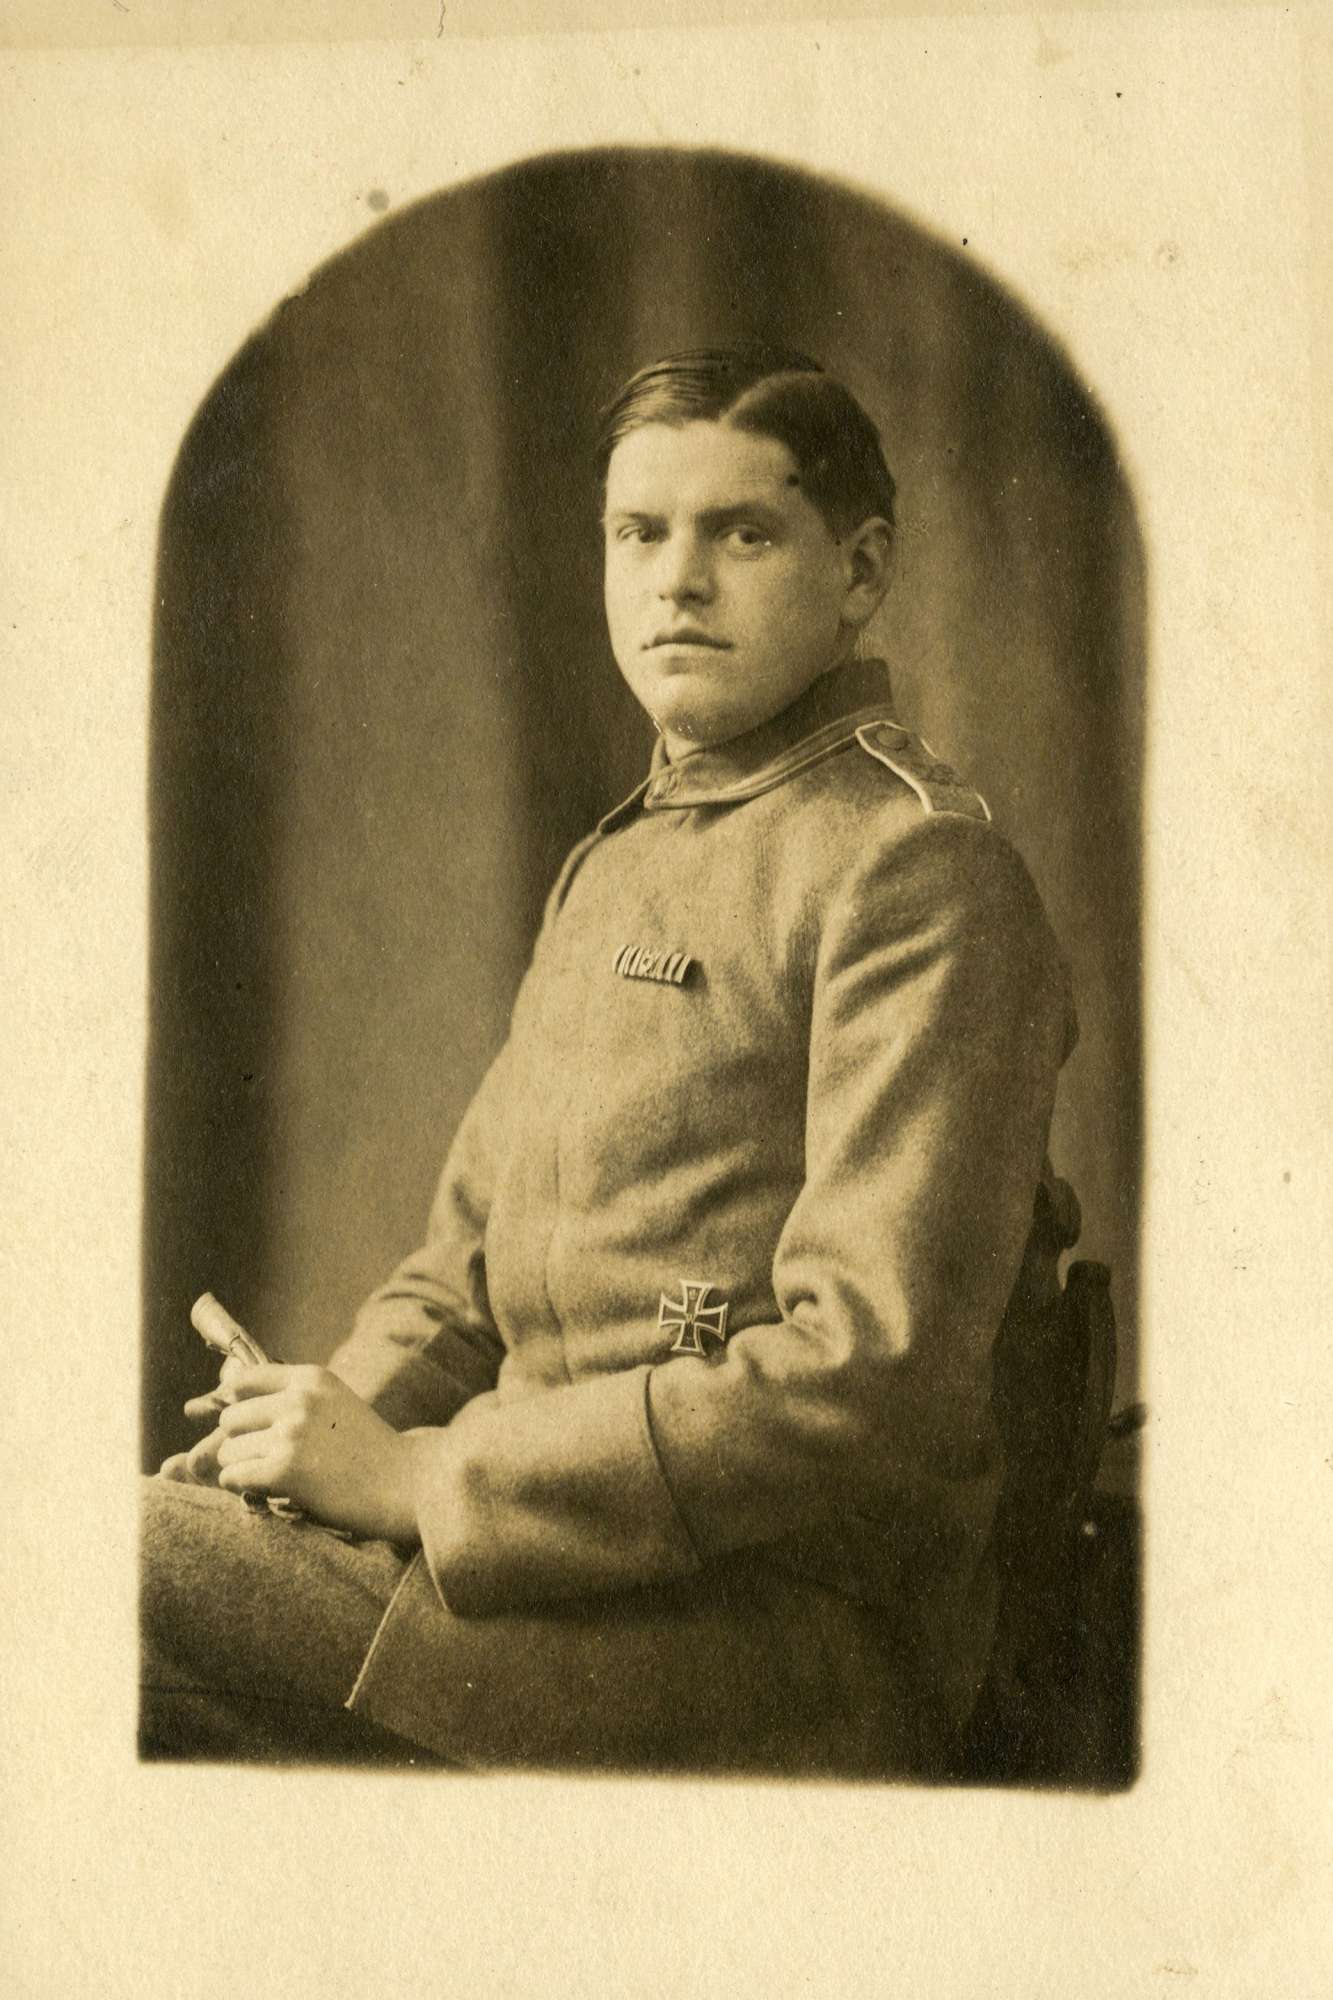 Heberle, Karl, Bild 1